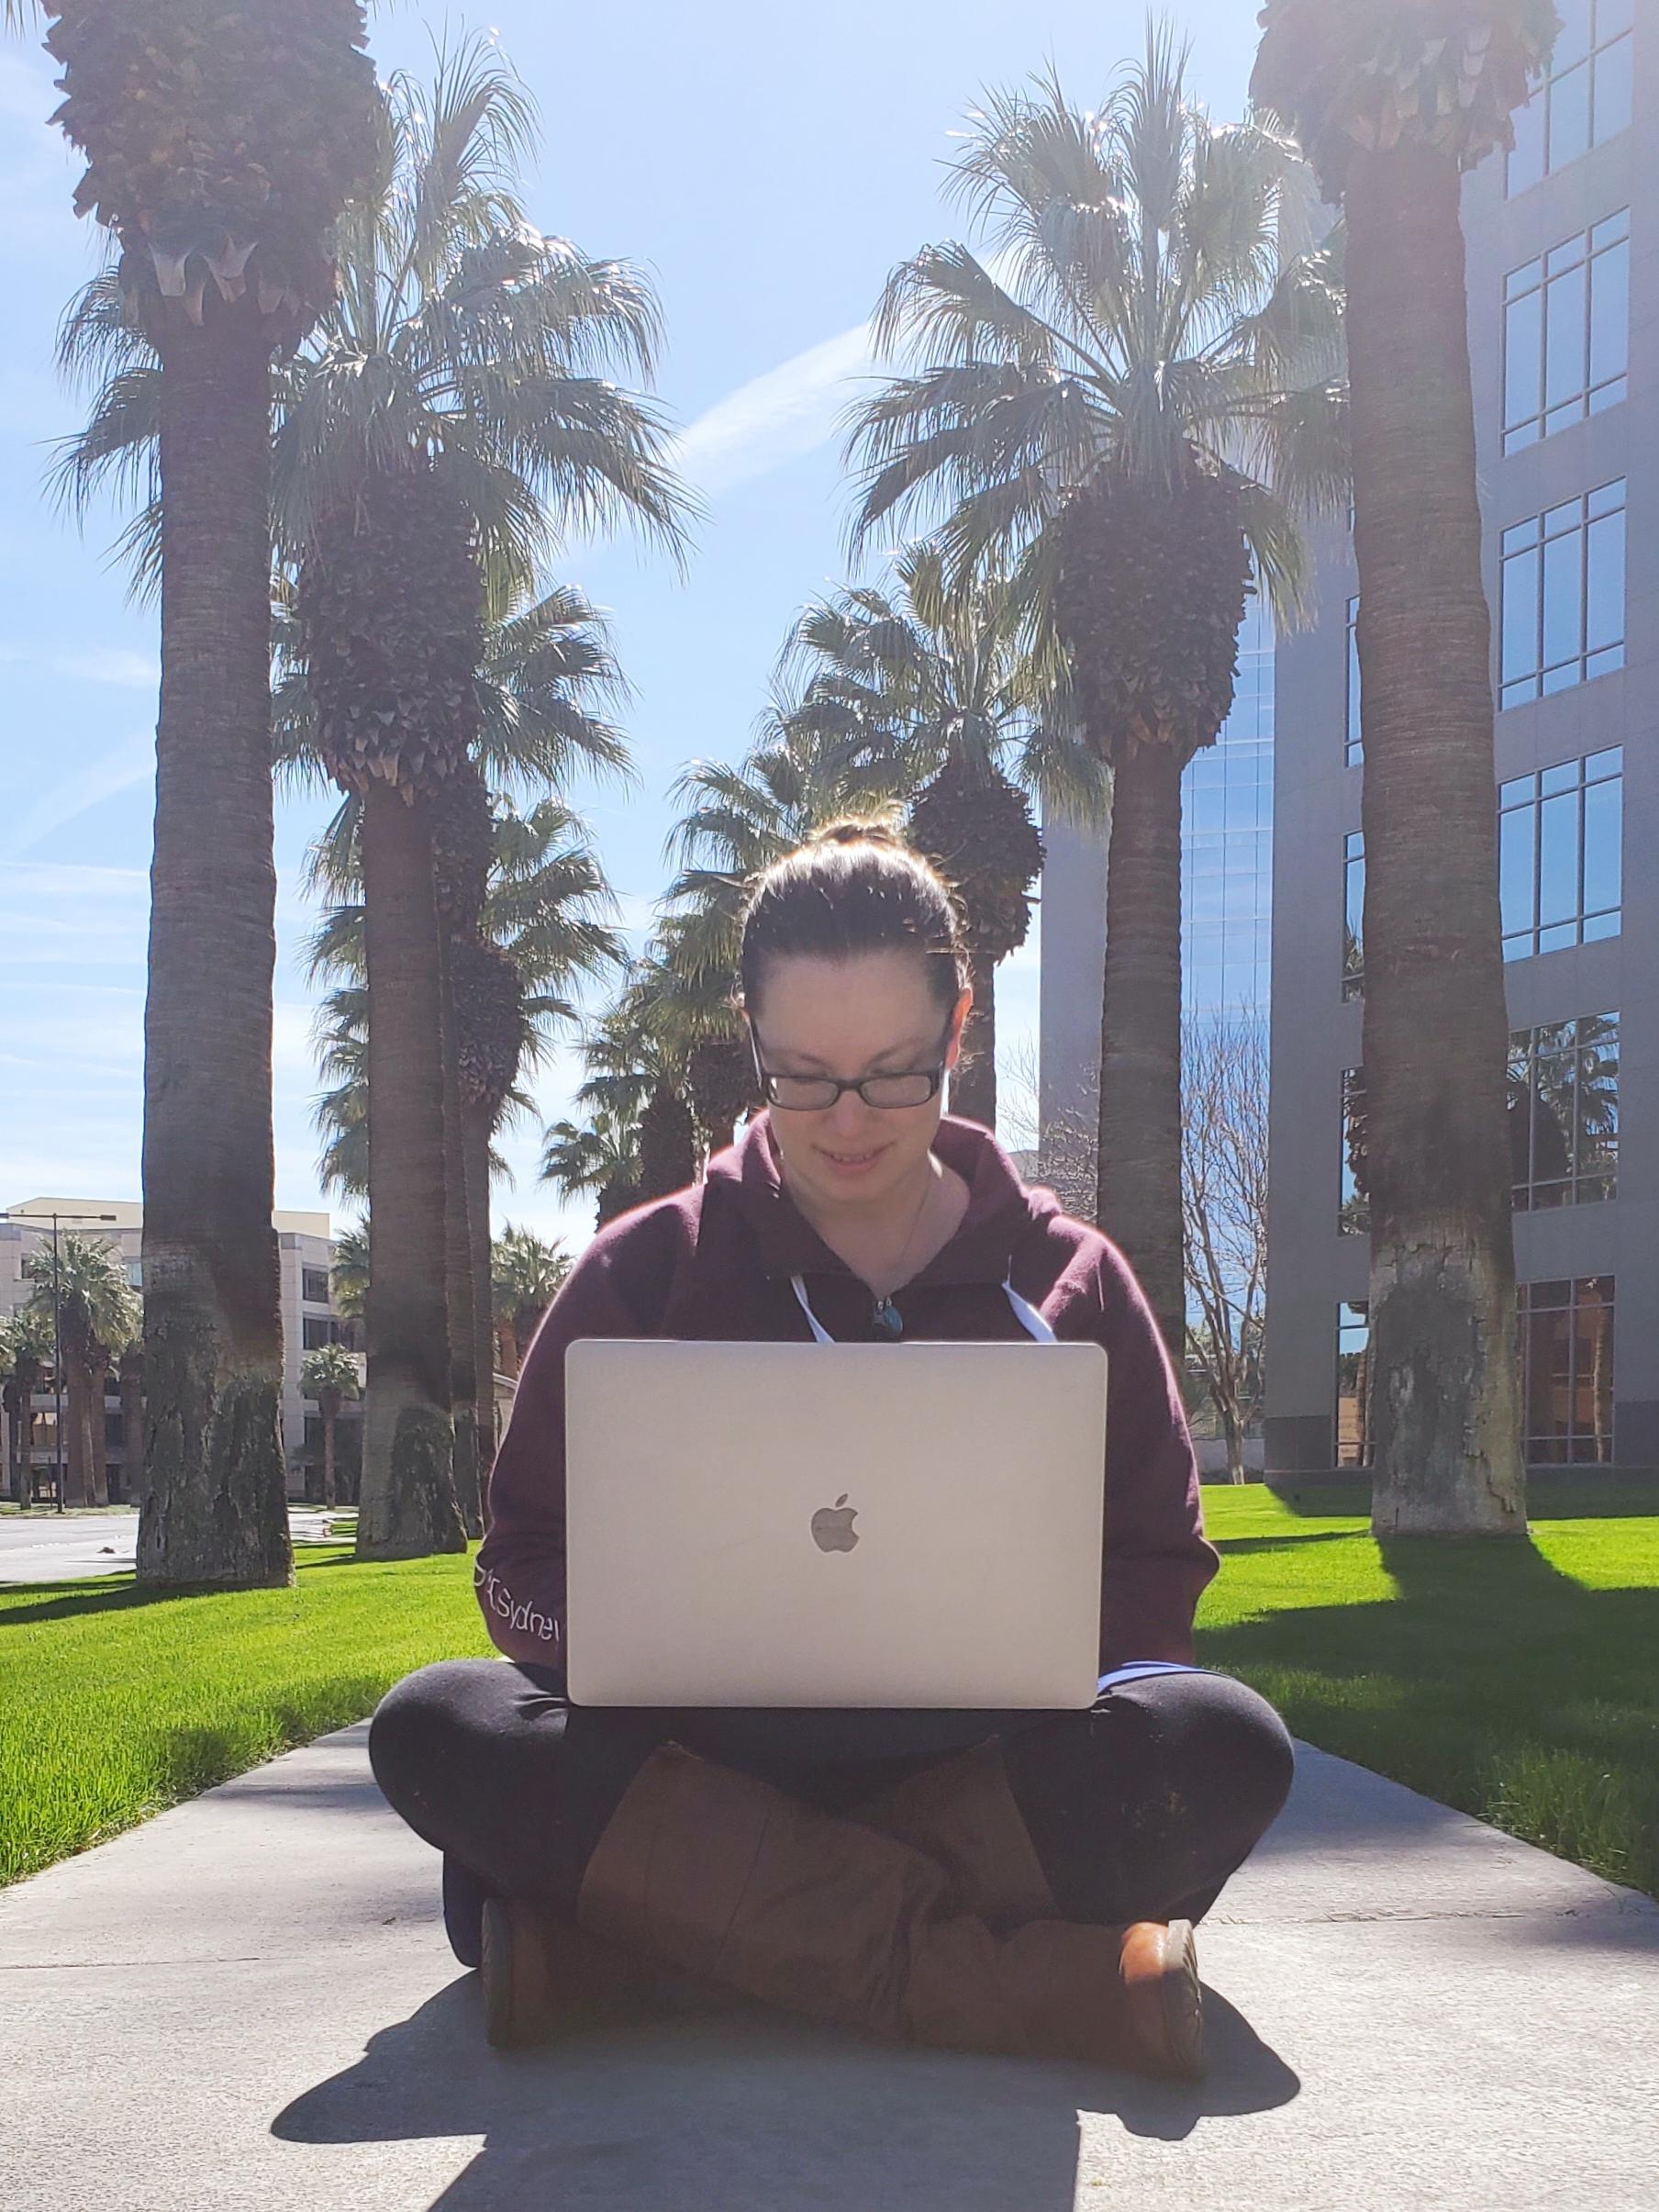 Working remote on the sidewalk